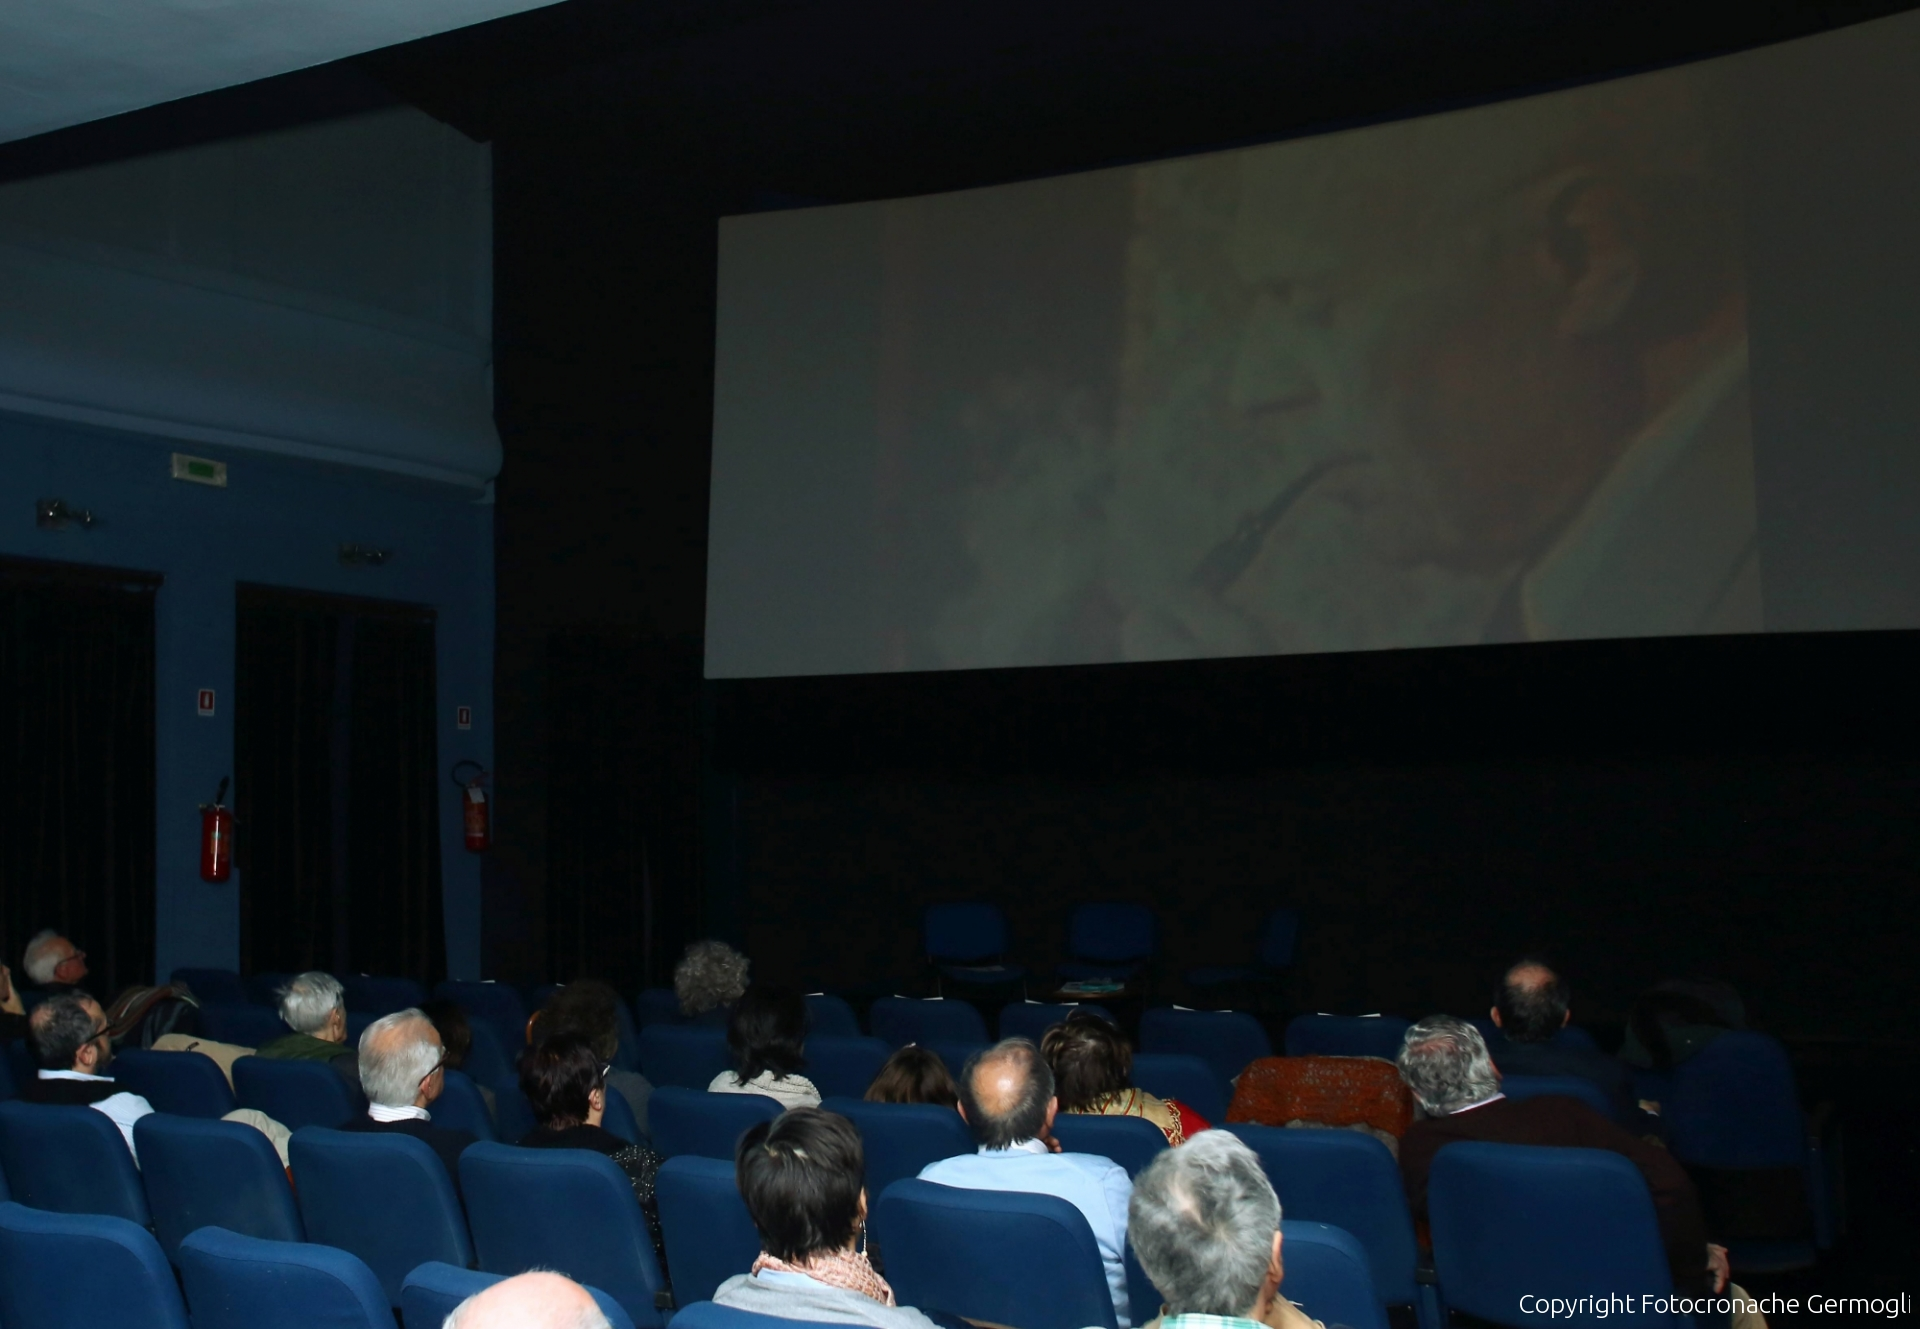 Tornano i CinemaDays. Dal 9 al 12 Aprile film a 3 euro